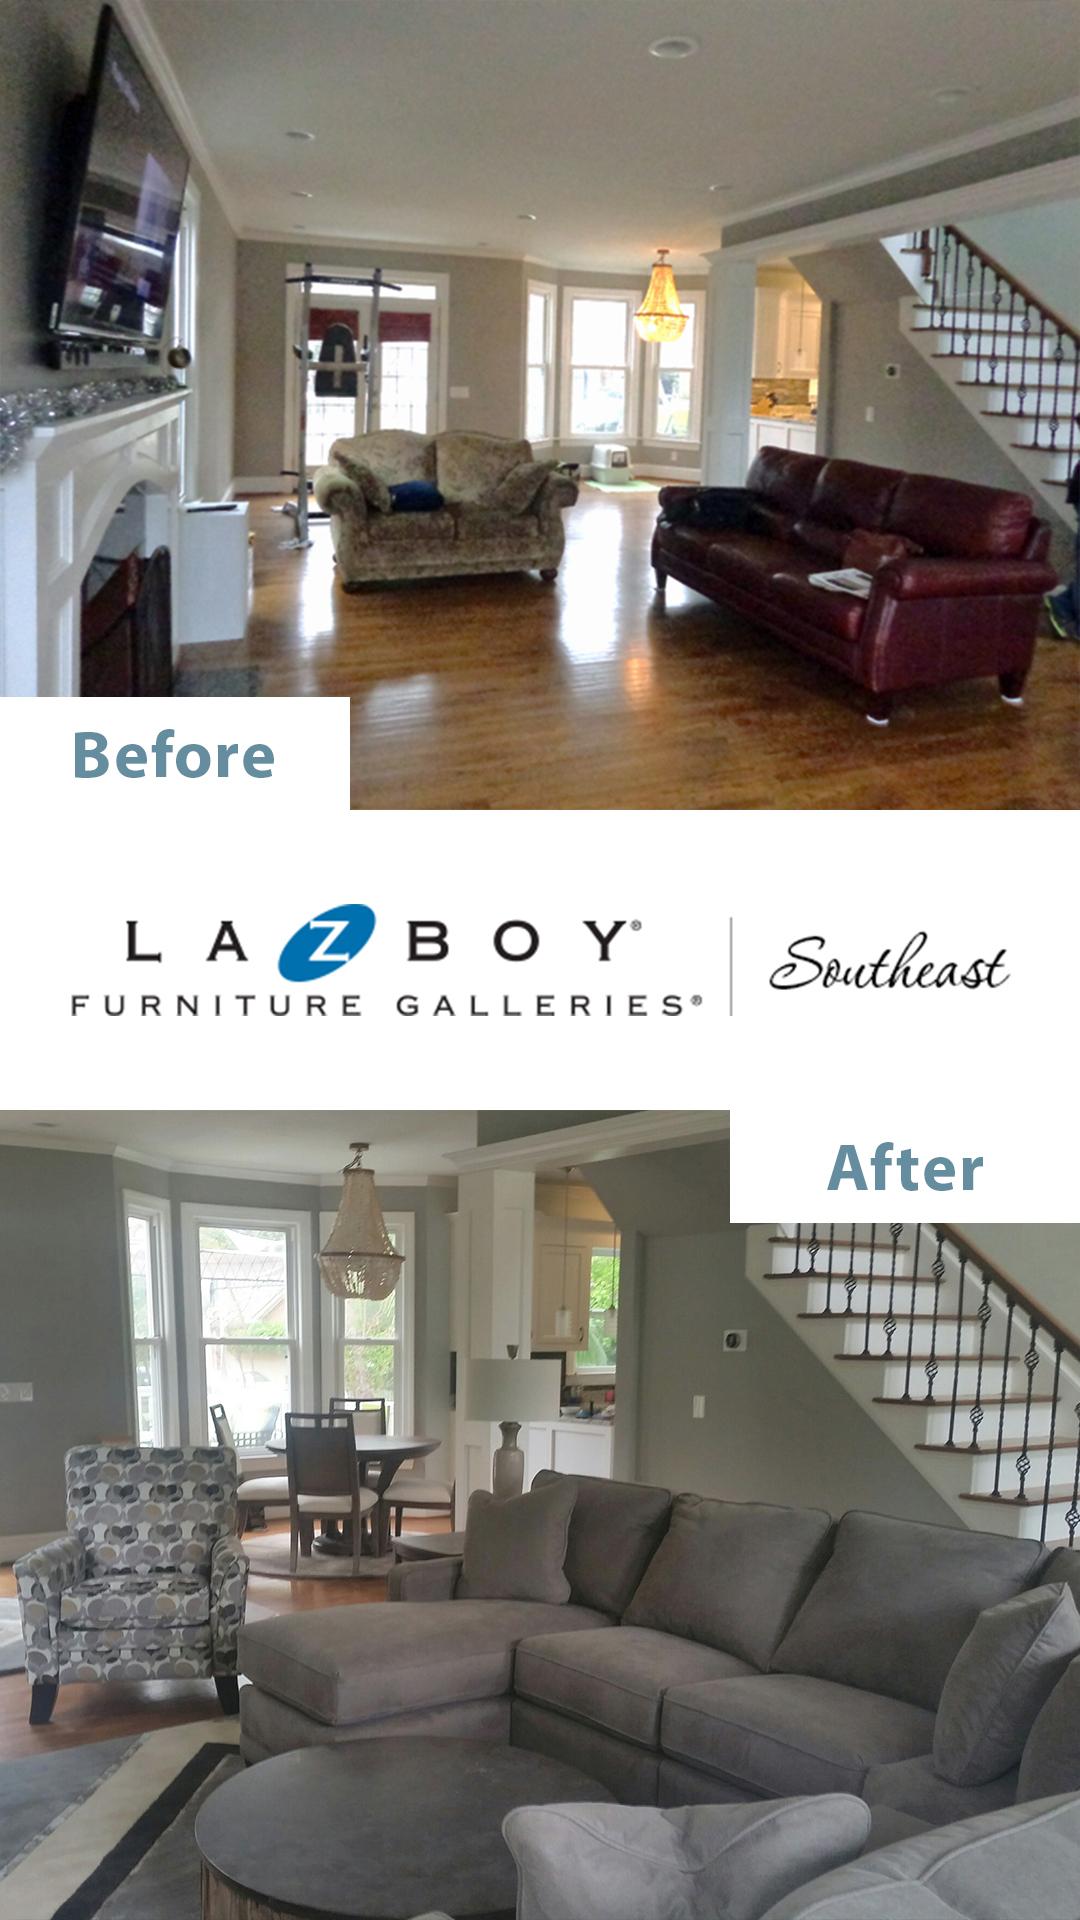 7 La Z Boy Interior Design Before Amp After Pictures